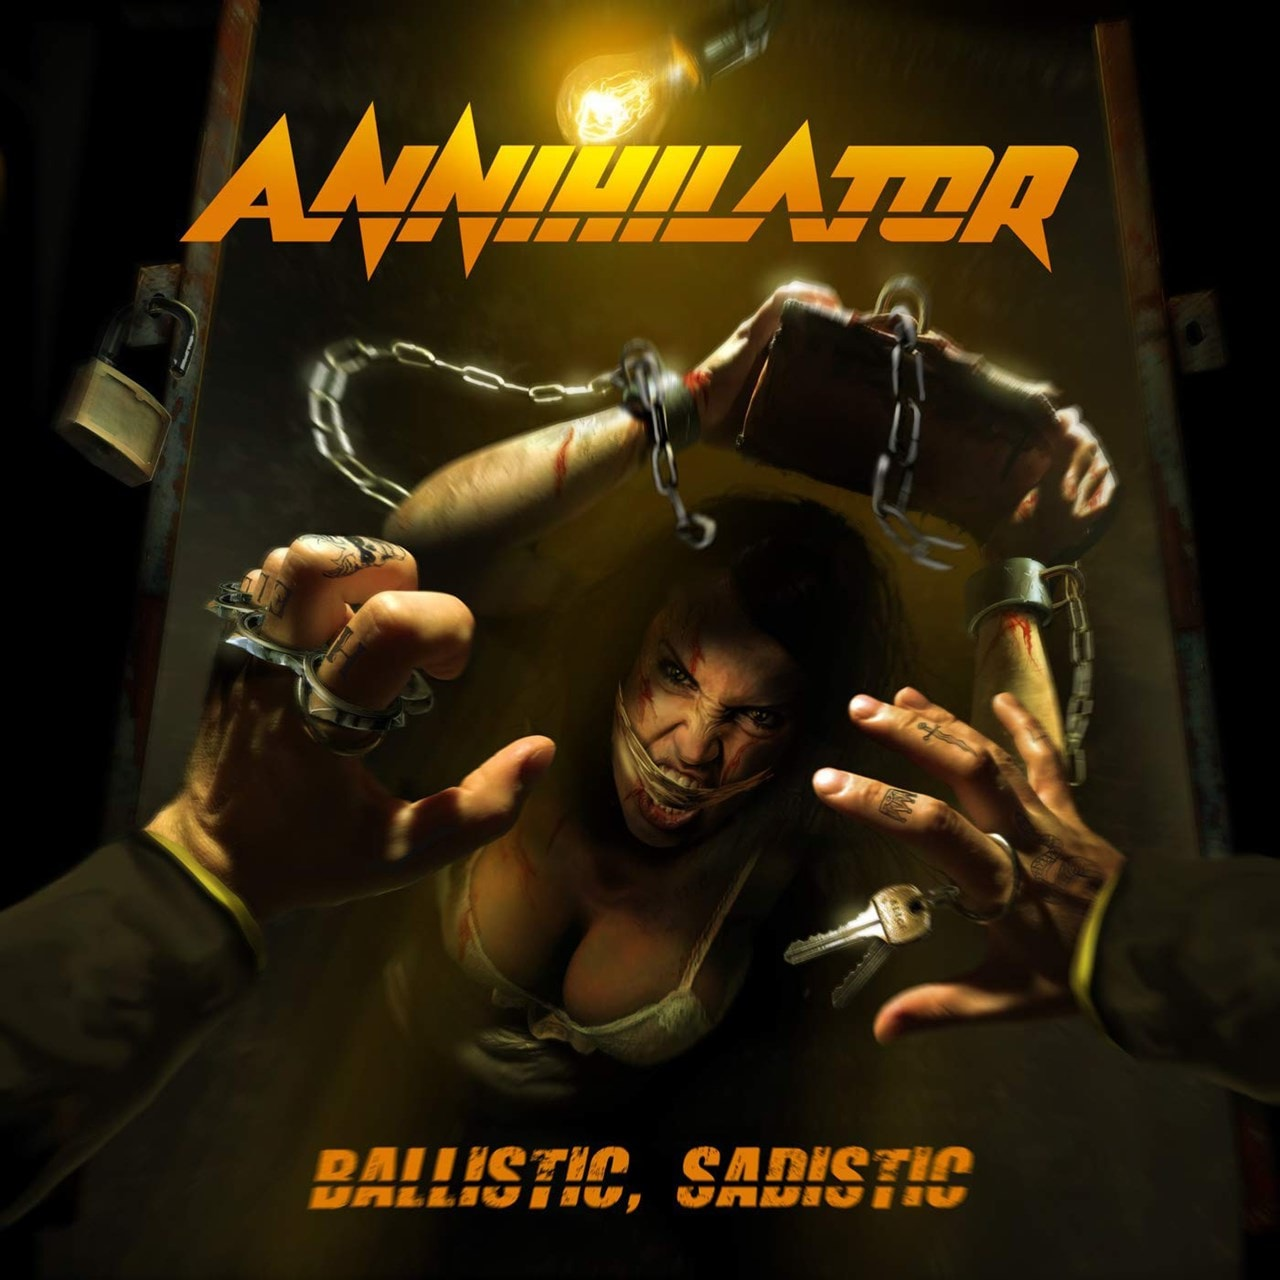 Ballistic, Sadistic - 1